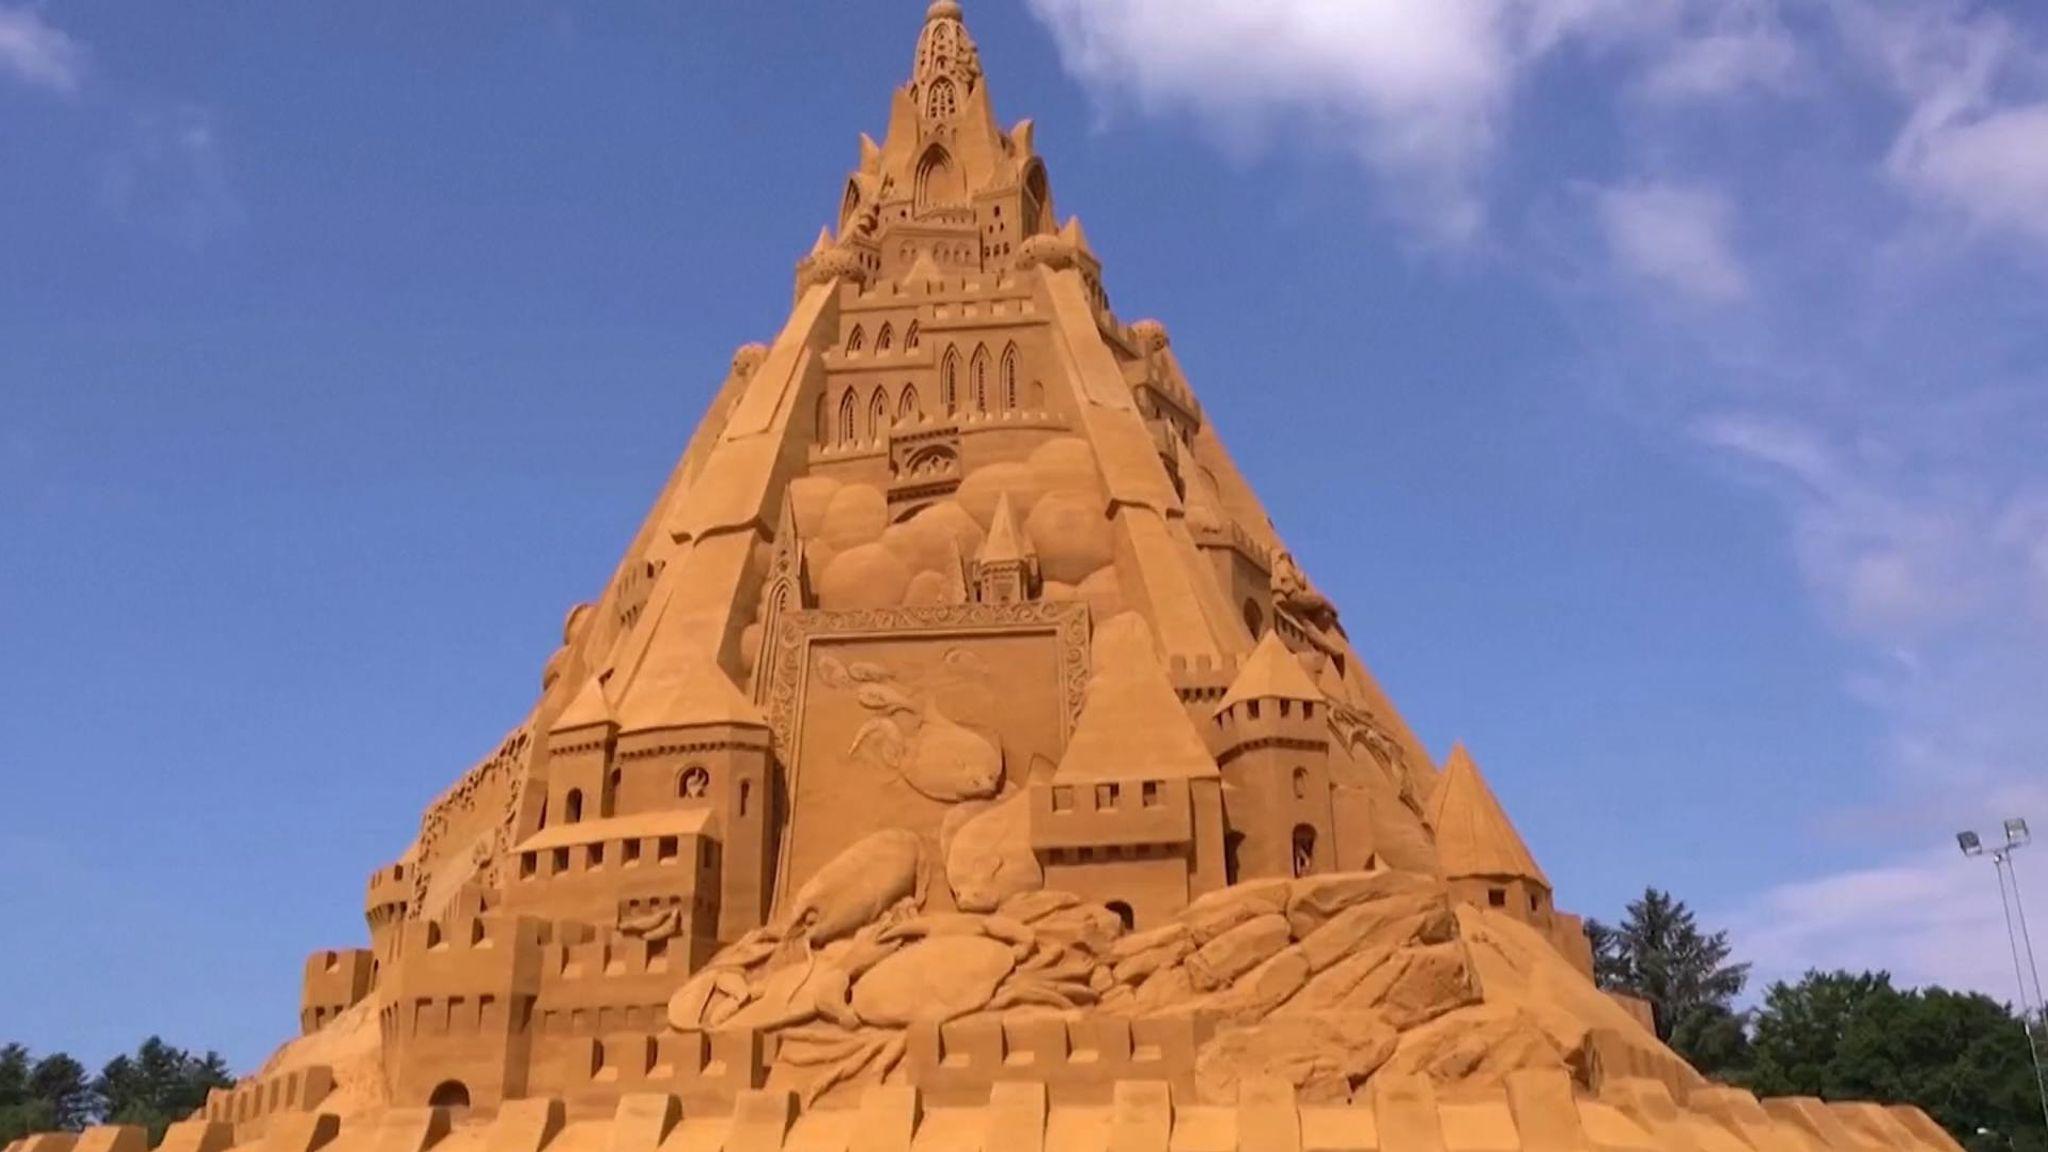 World's tallest sandcastle constructed in Denmark | டென்மார்க்கில் உலகின் மிக உயரமான மணல் கோட்டை கட்டப்பட்டது |_40.1